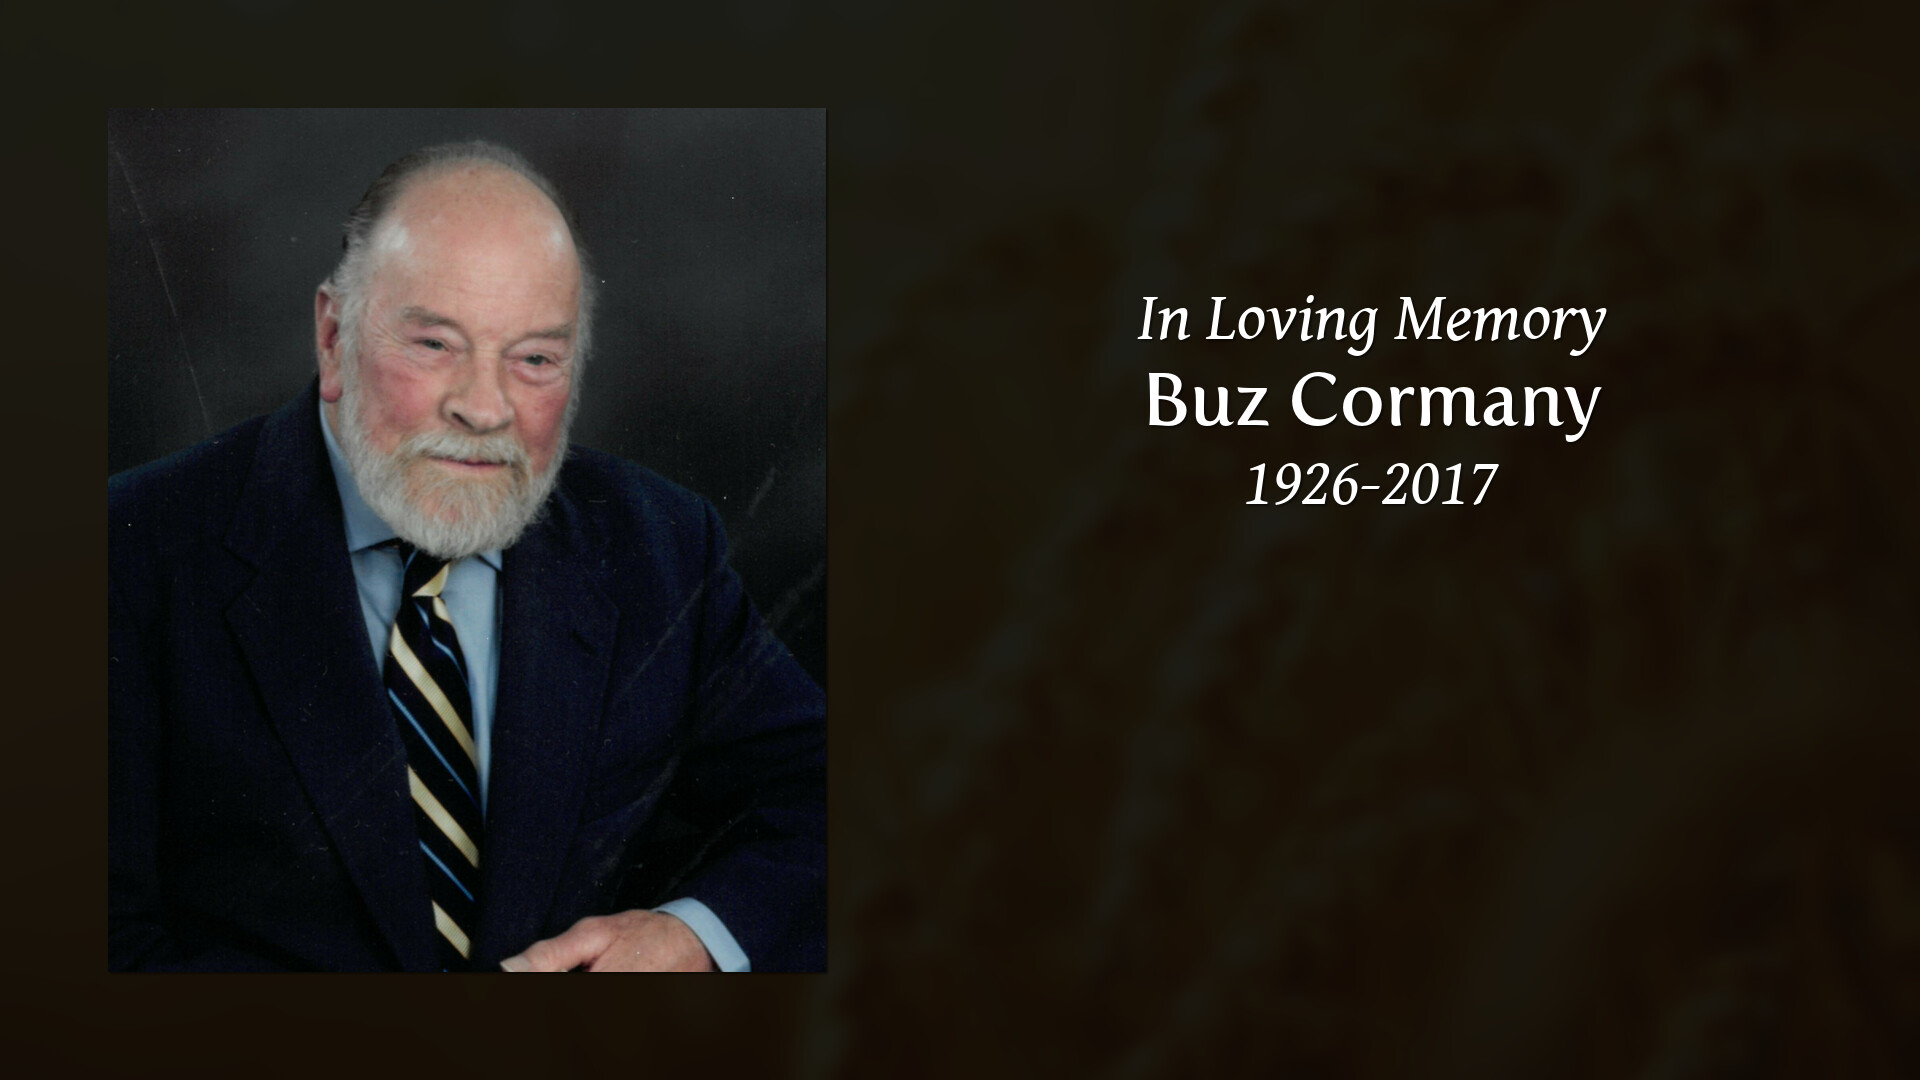 Obituary | Charles Buz Cormany | Waite & Son Funeral Homes